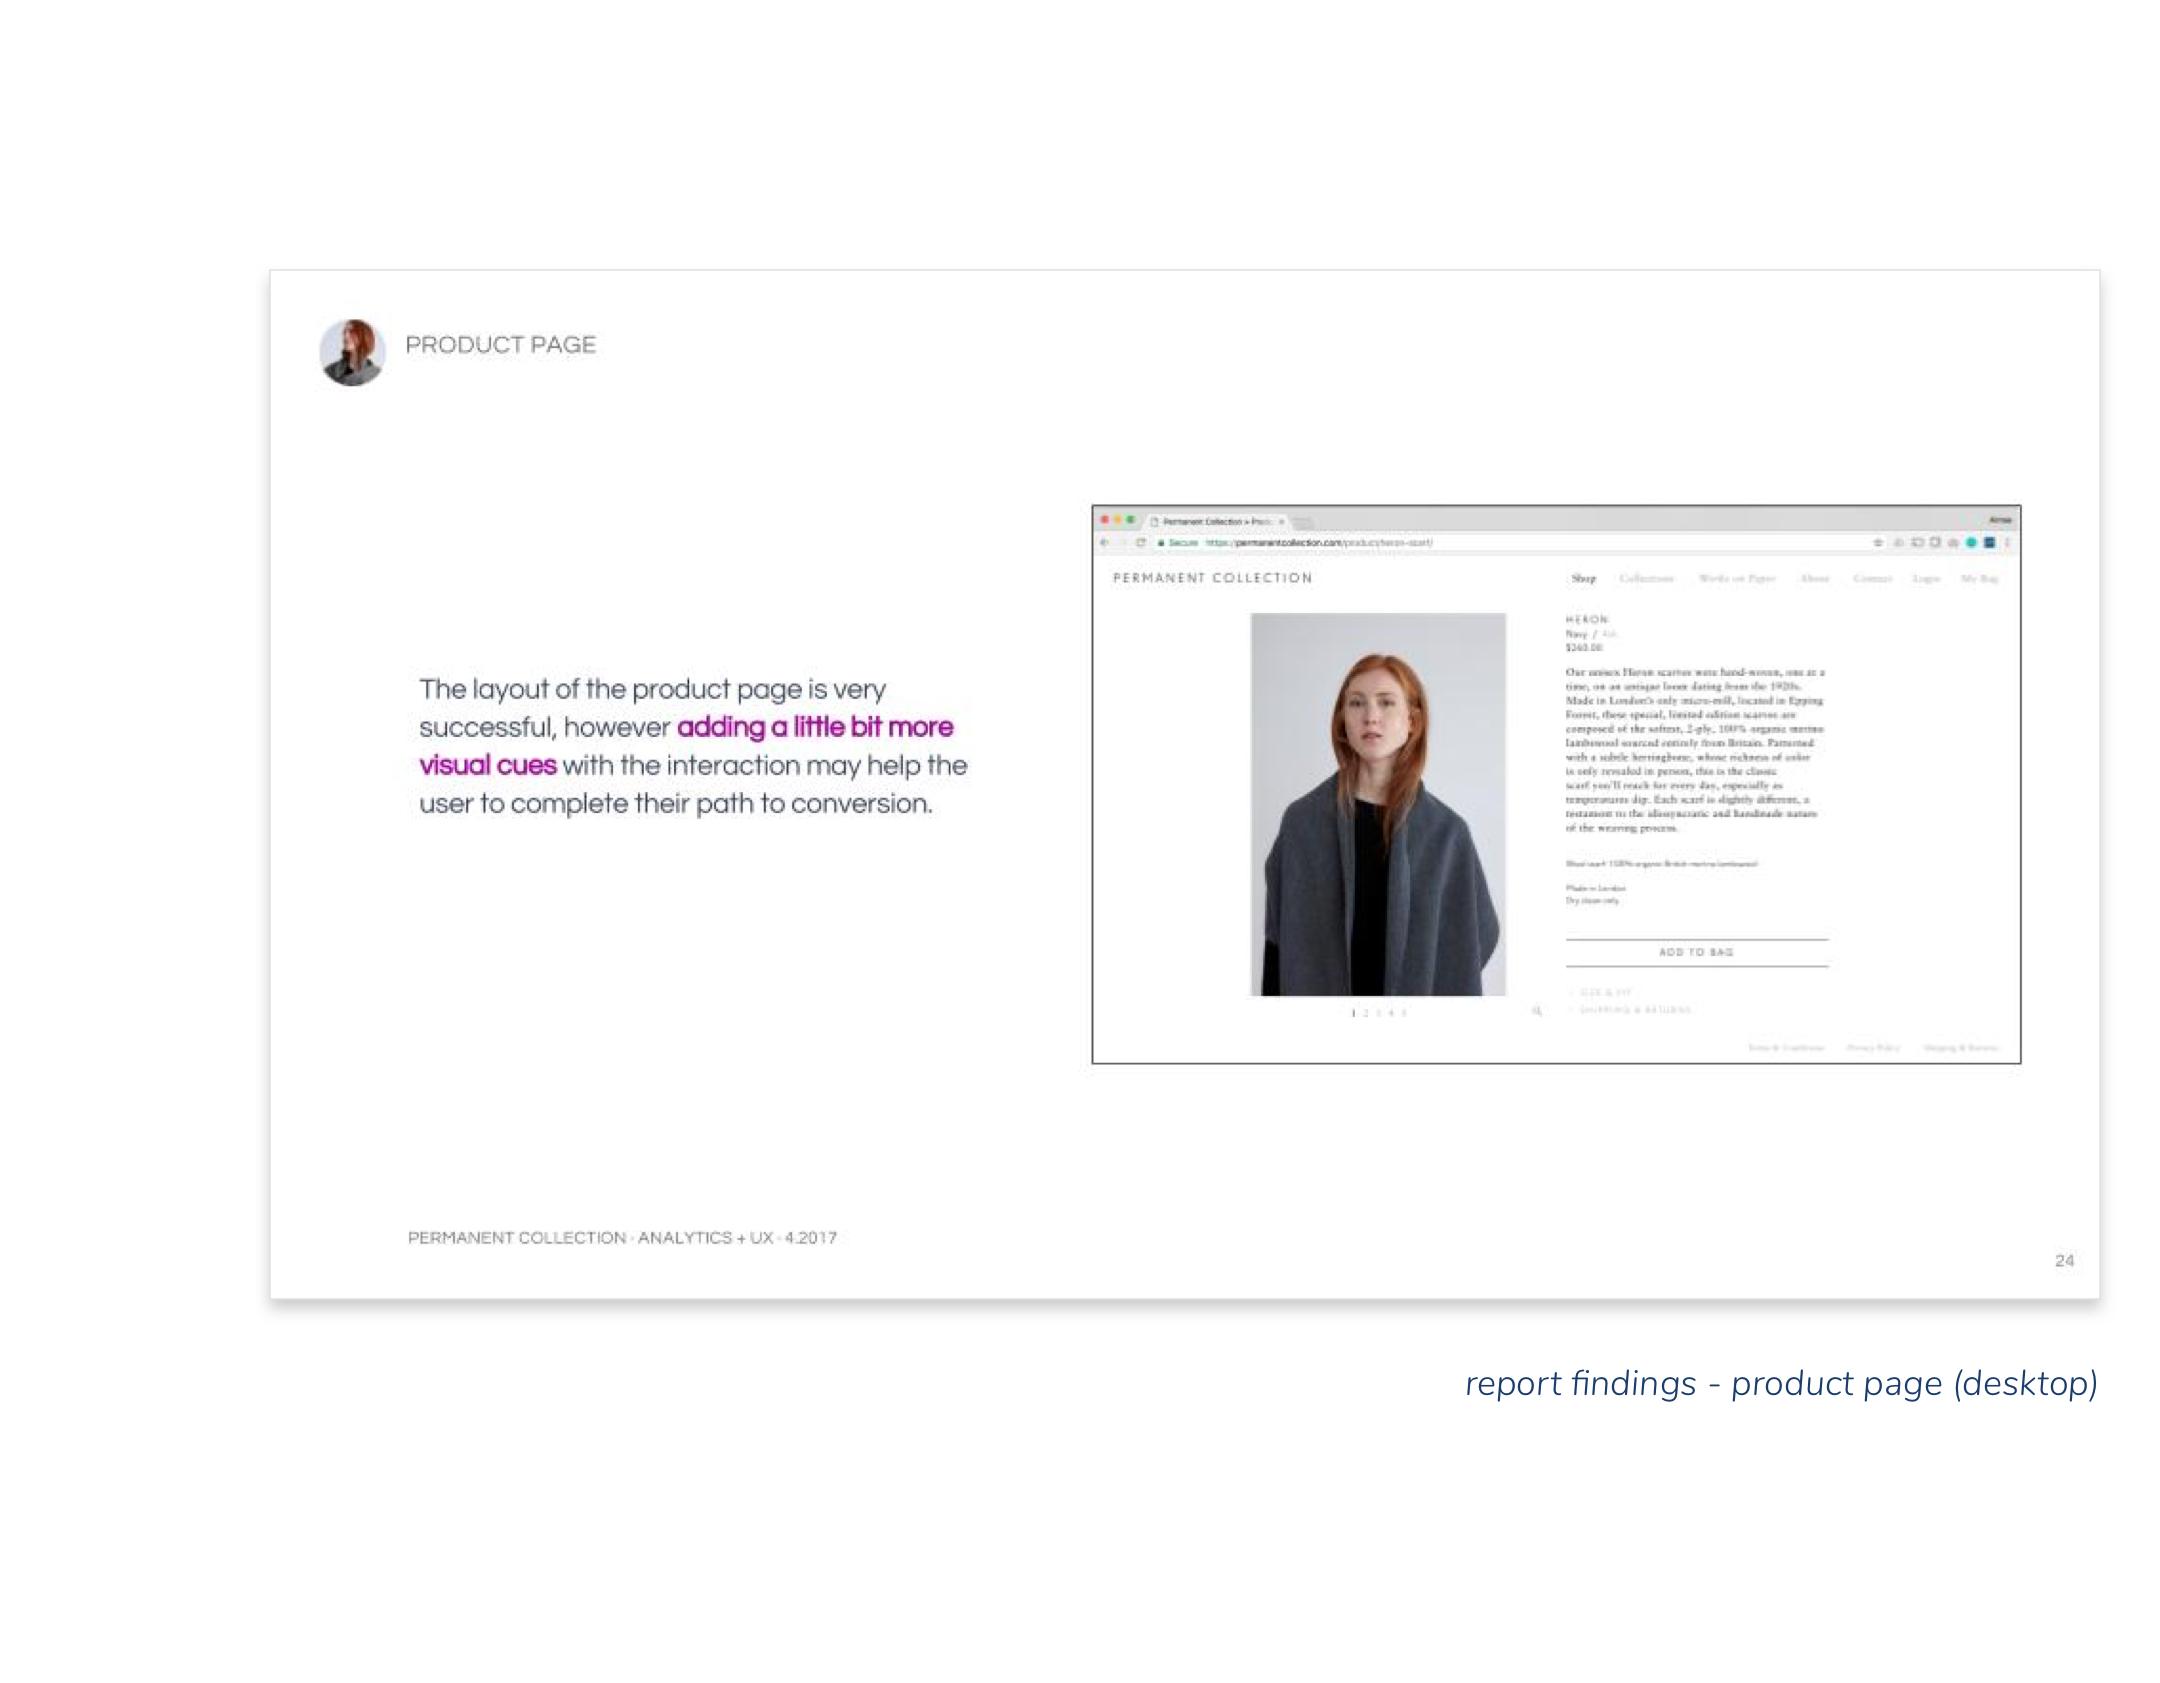 productpage_Desktop.jpg